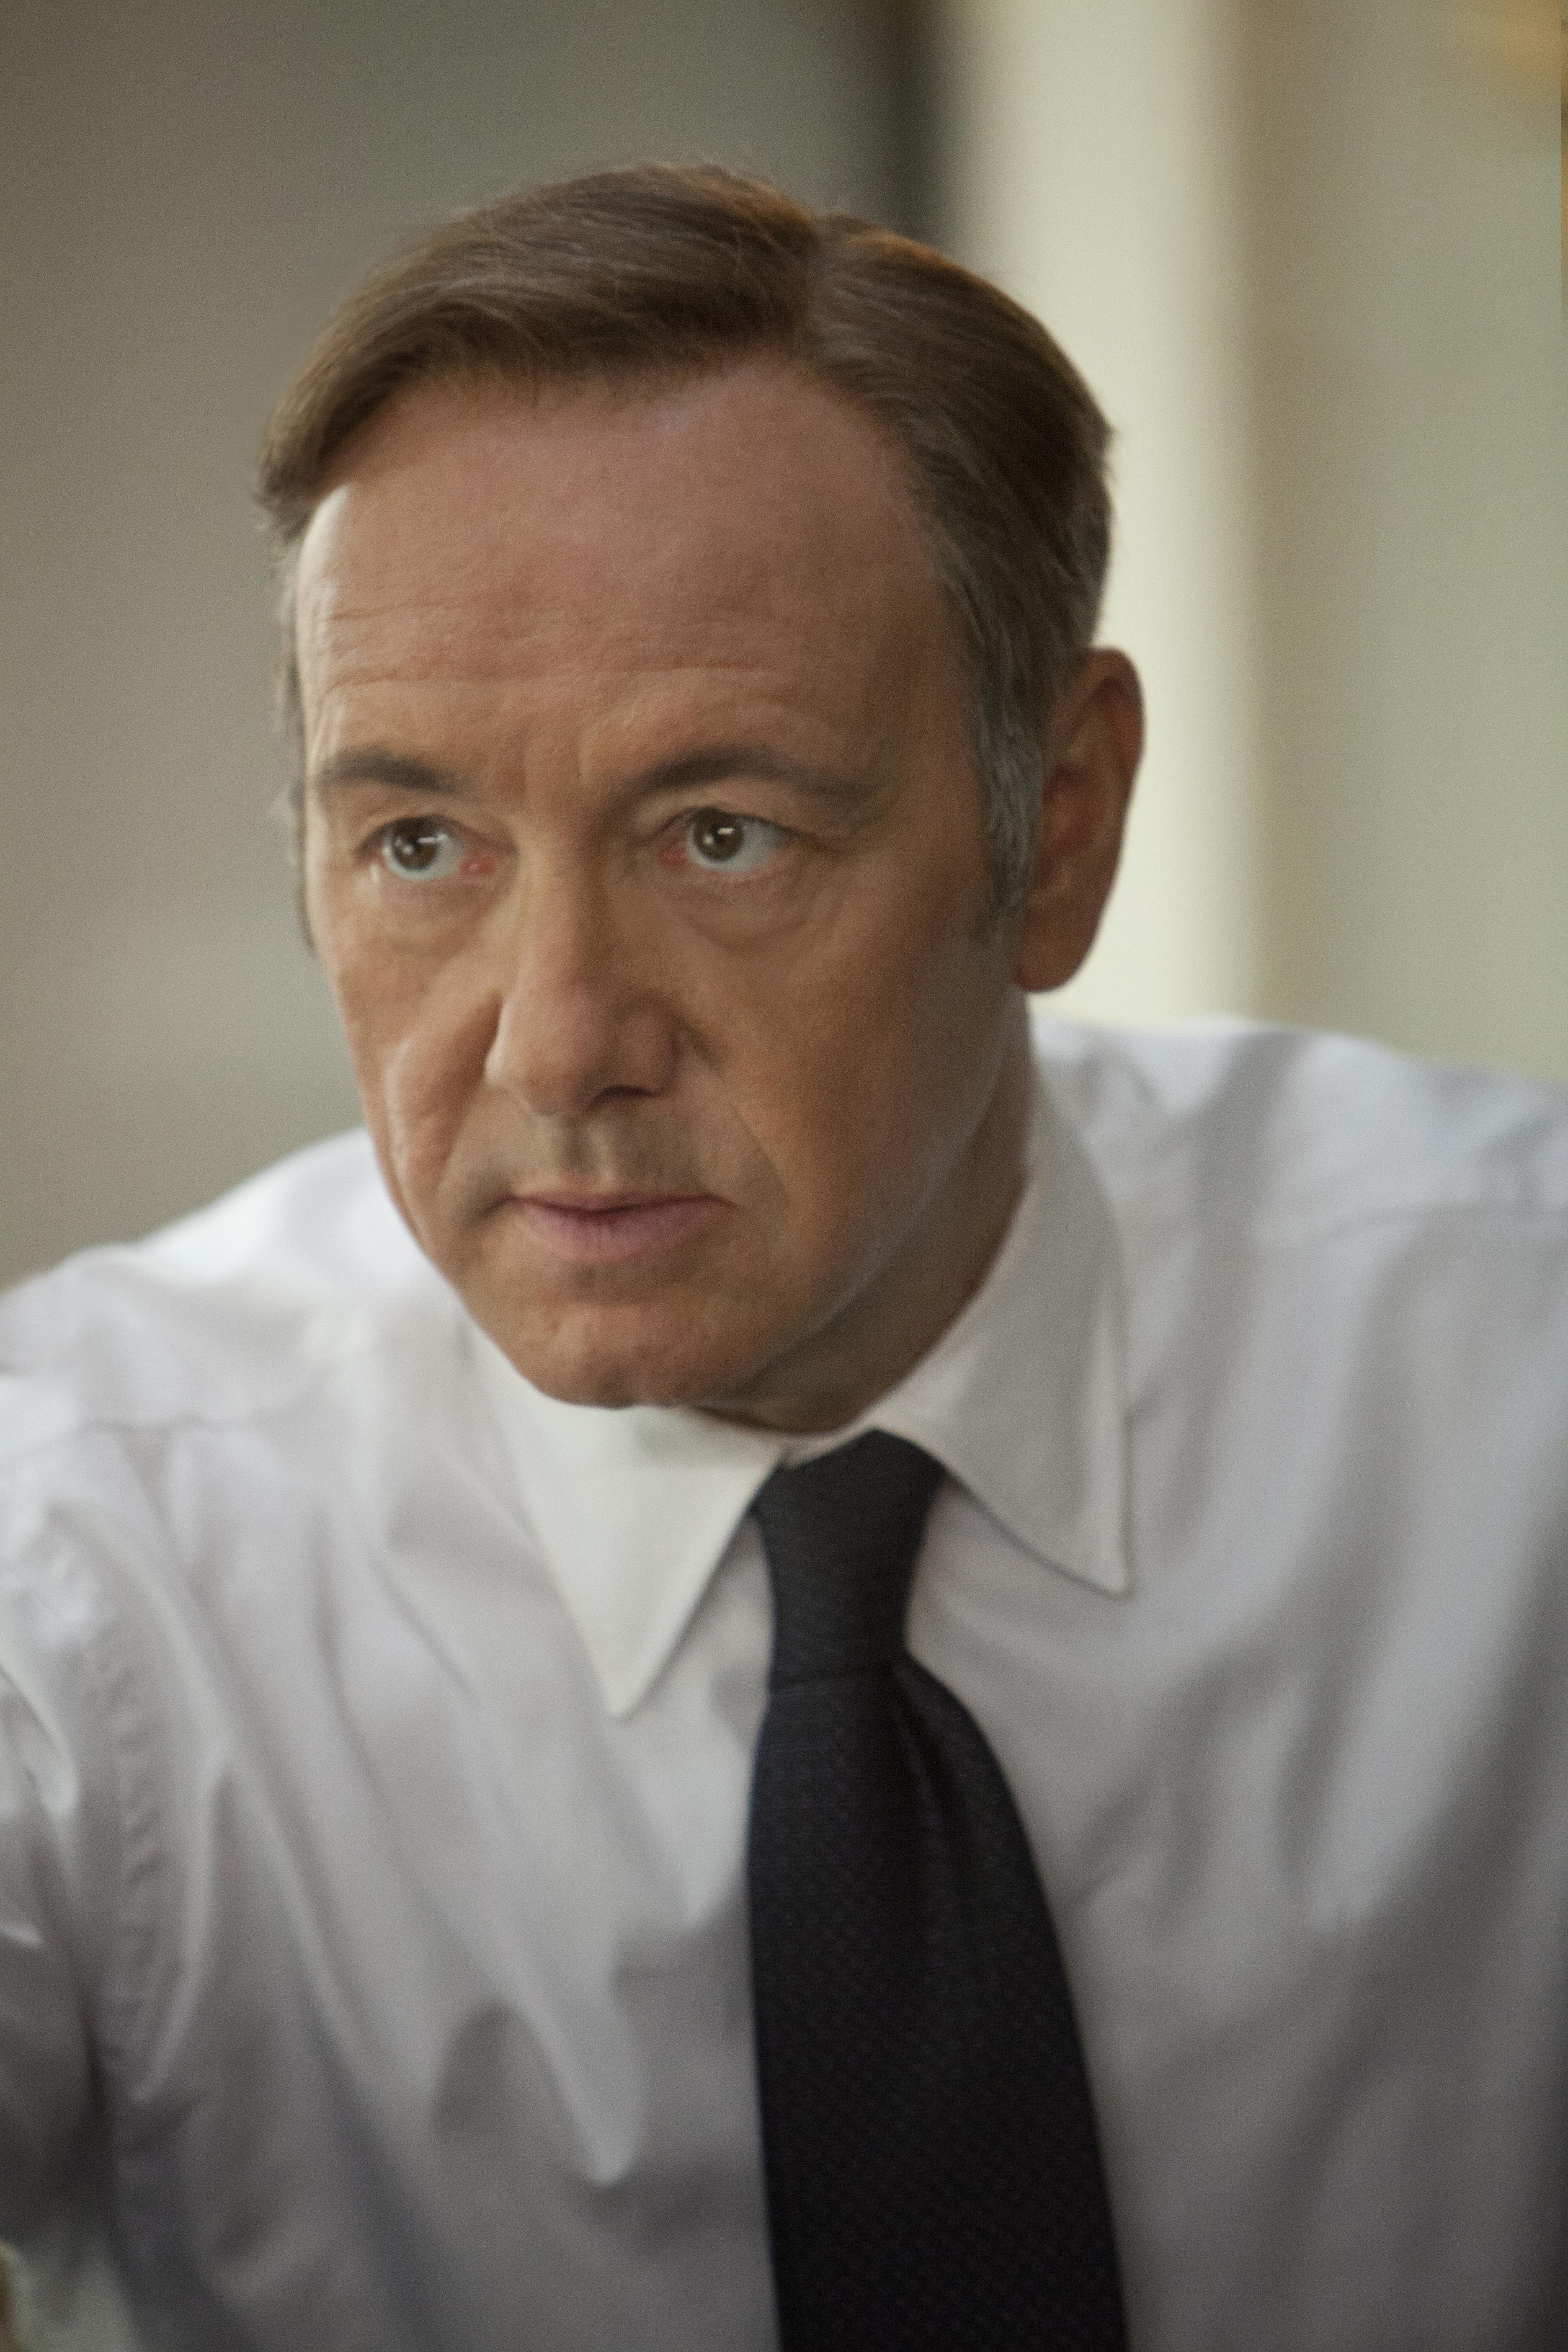 House of Cards: Kevin Spacey interpreta Francis Underwood